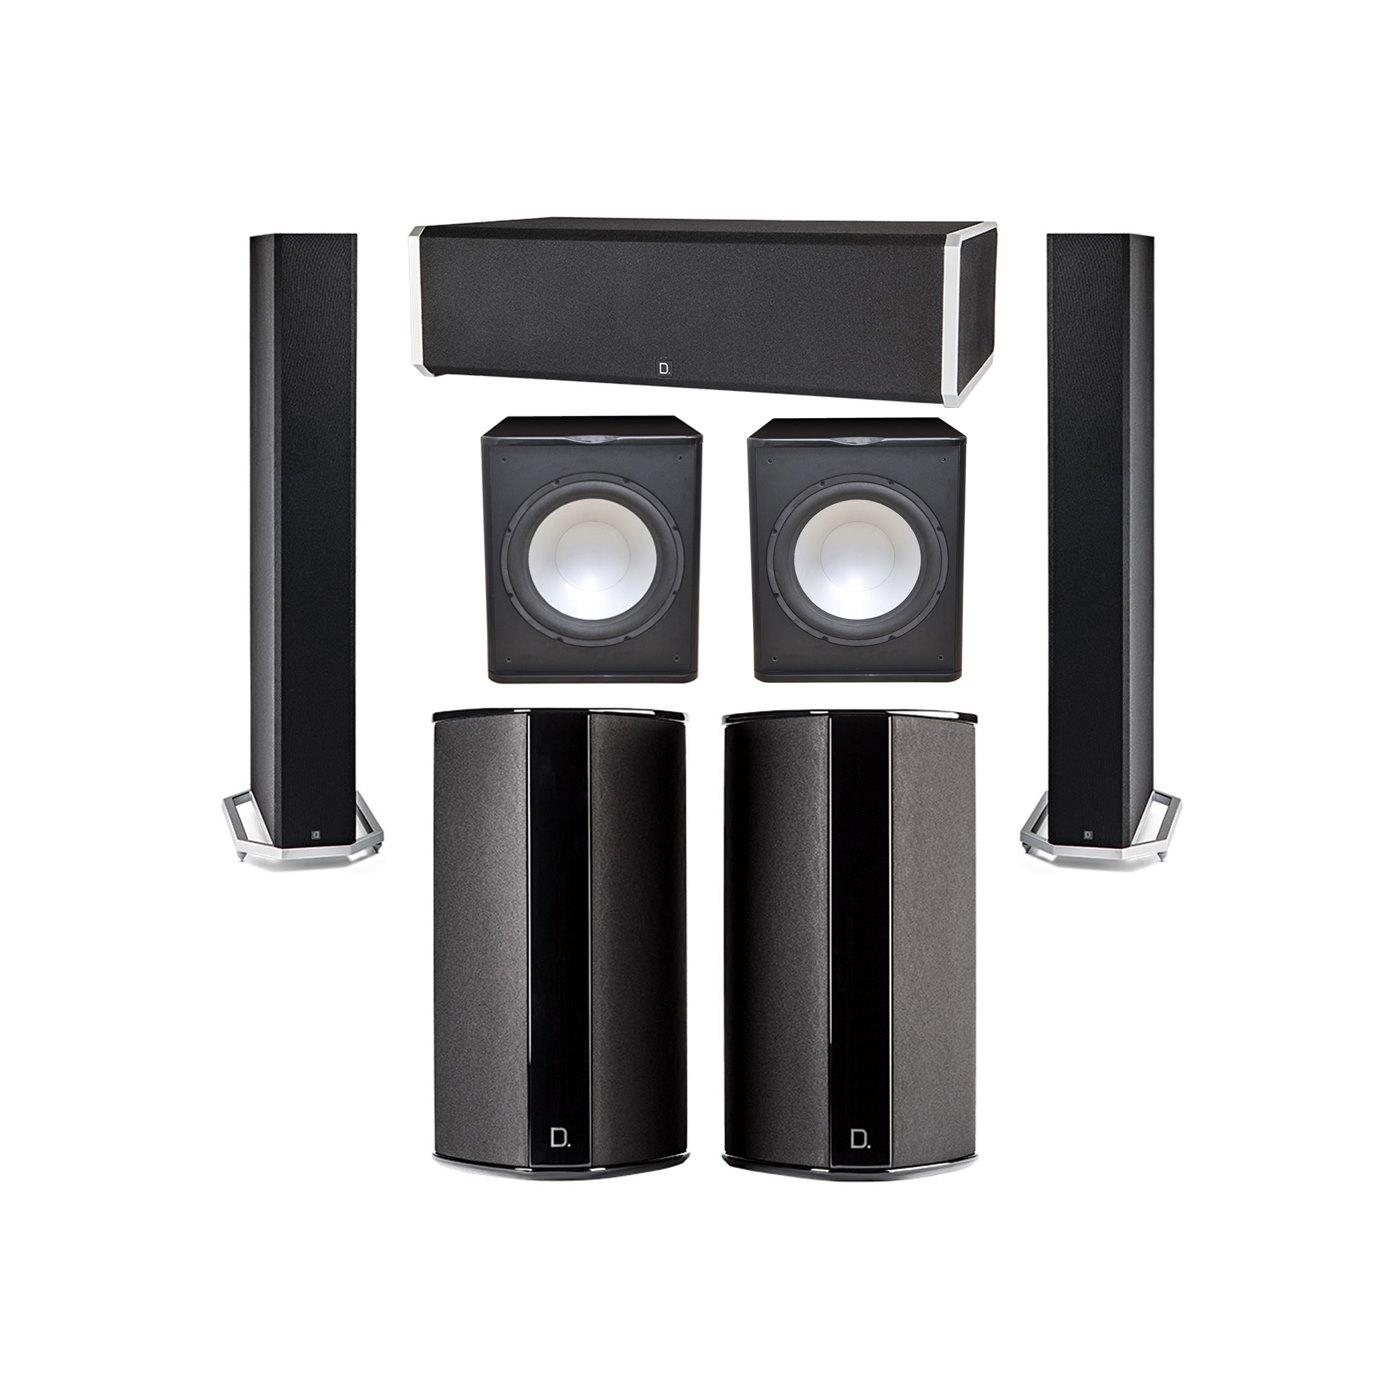 Definitive Technology 5.2 System with 2 BP9060 Tower Speakers, 1 CS9060 Center Channel Speaker, 2 SR9080 Surround Speaker, 2 Premier Acoustic PA-150 Subwoofer